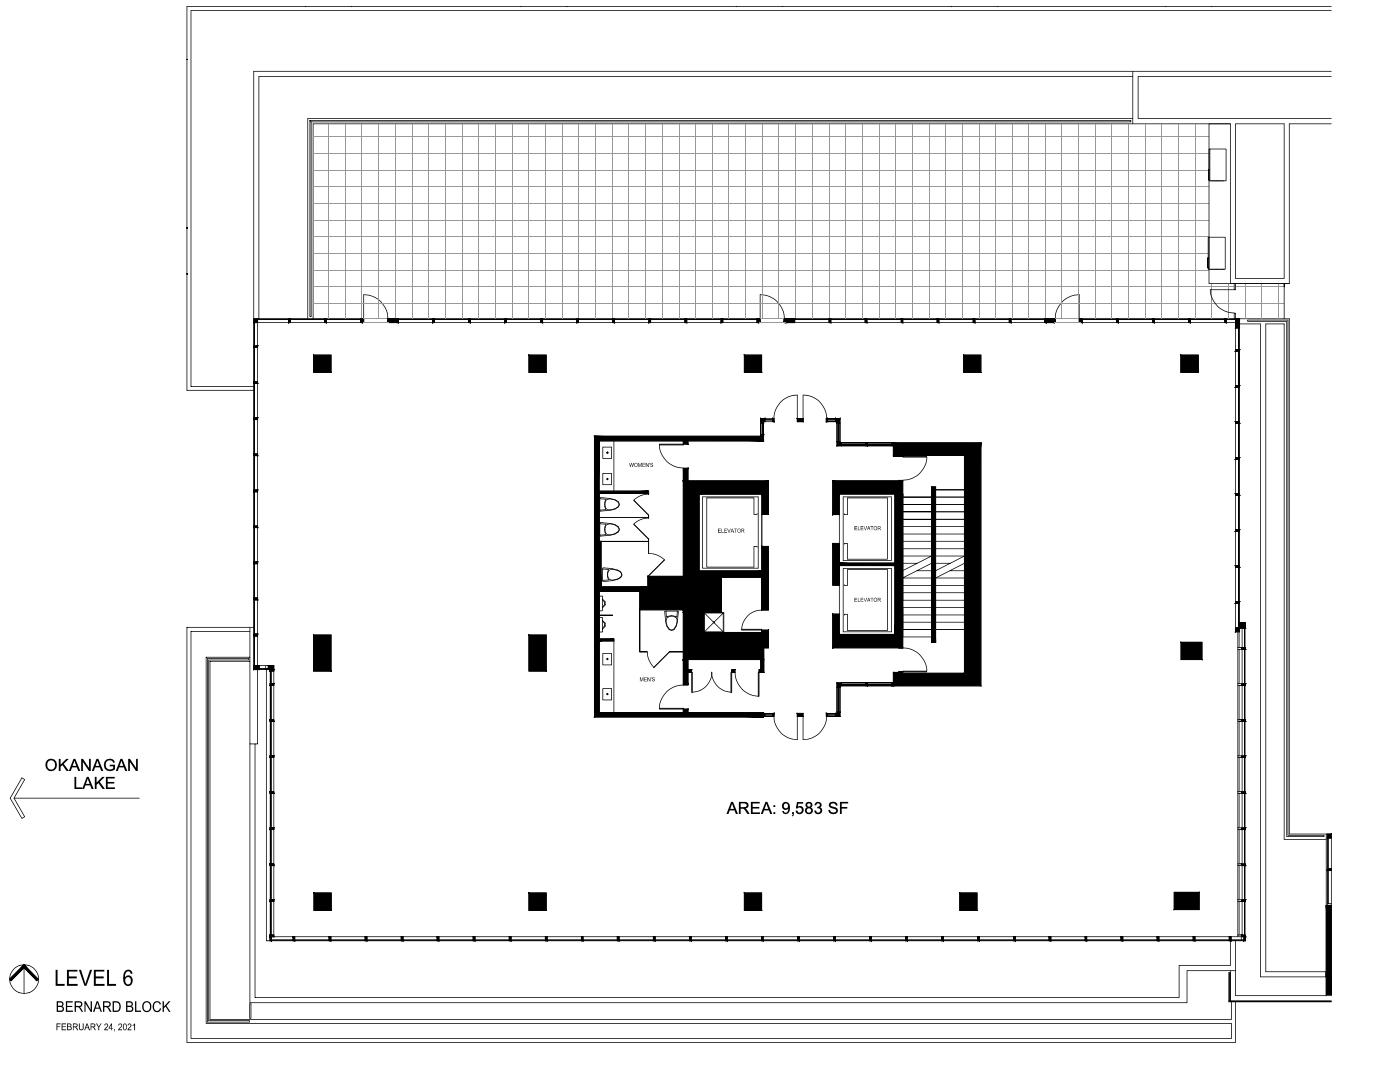 The Block Level 6 Floorplan